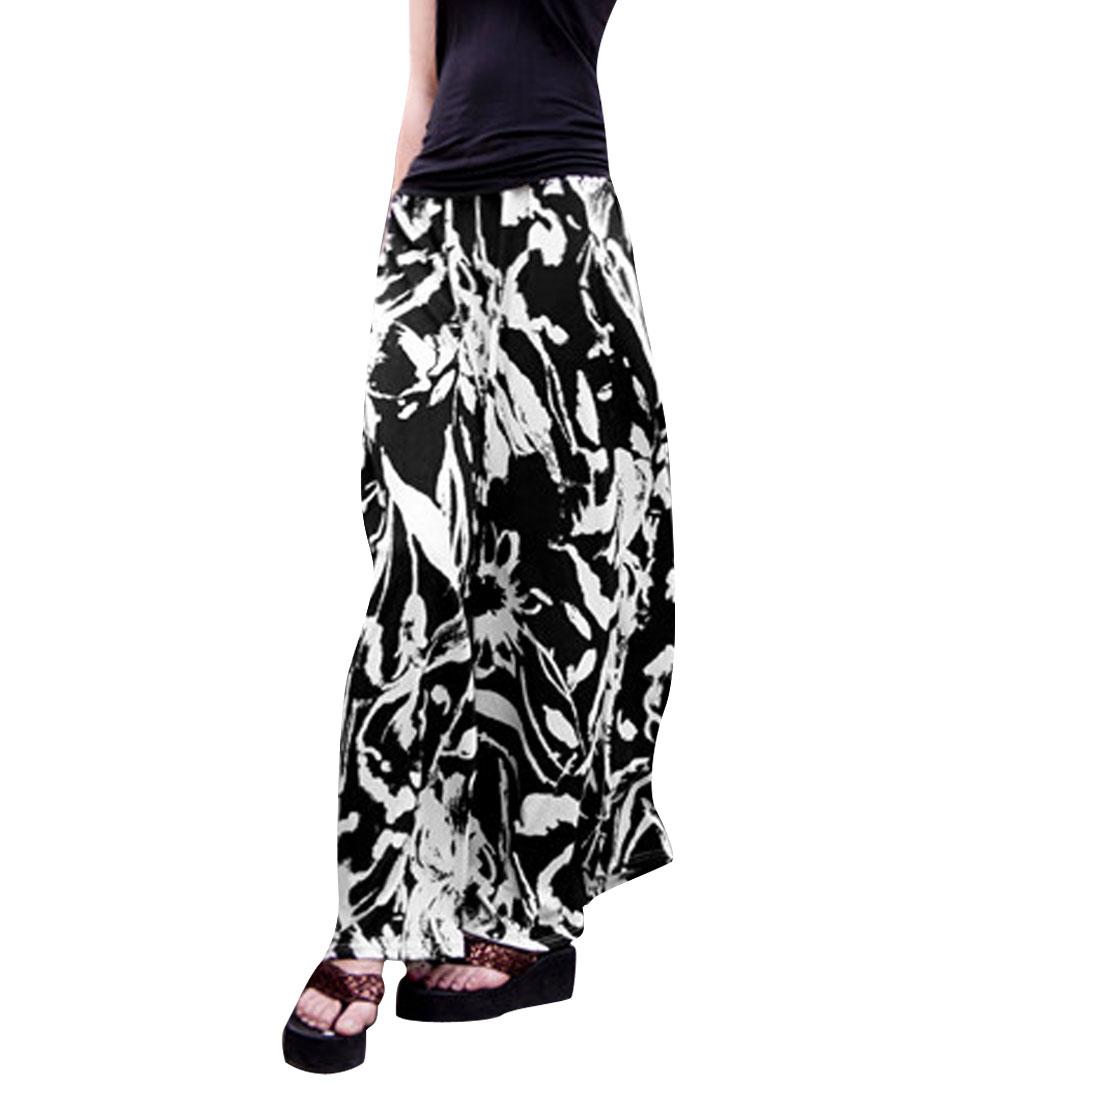 Lady Natural Waist Stylish Flower Prints Black White Long Pants XS